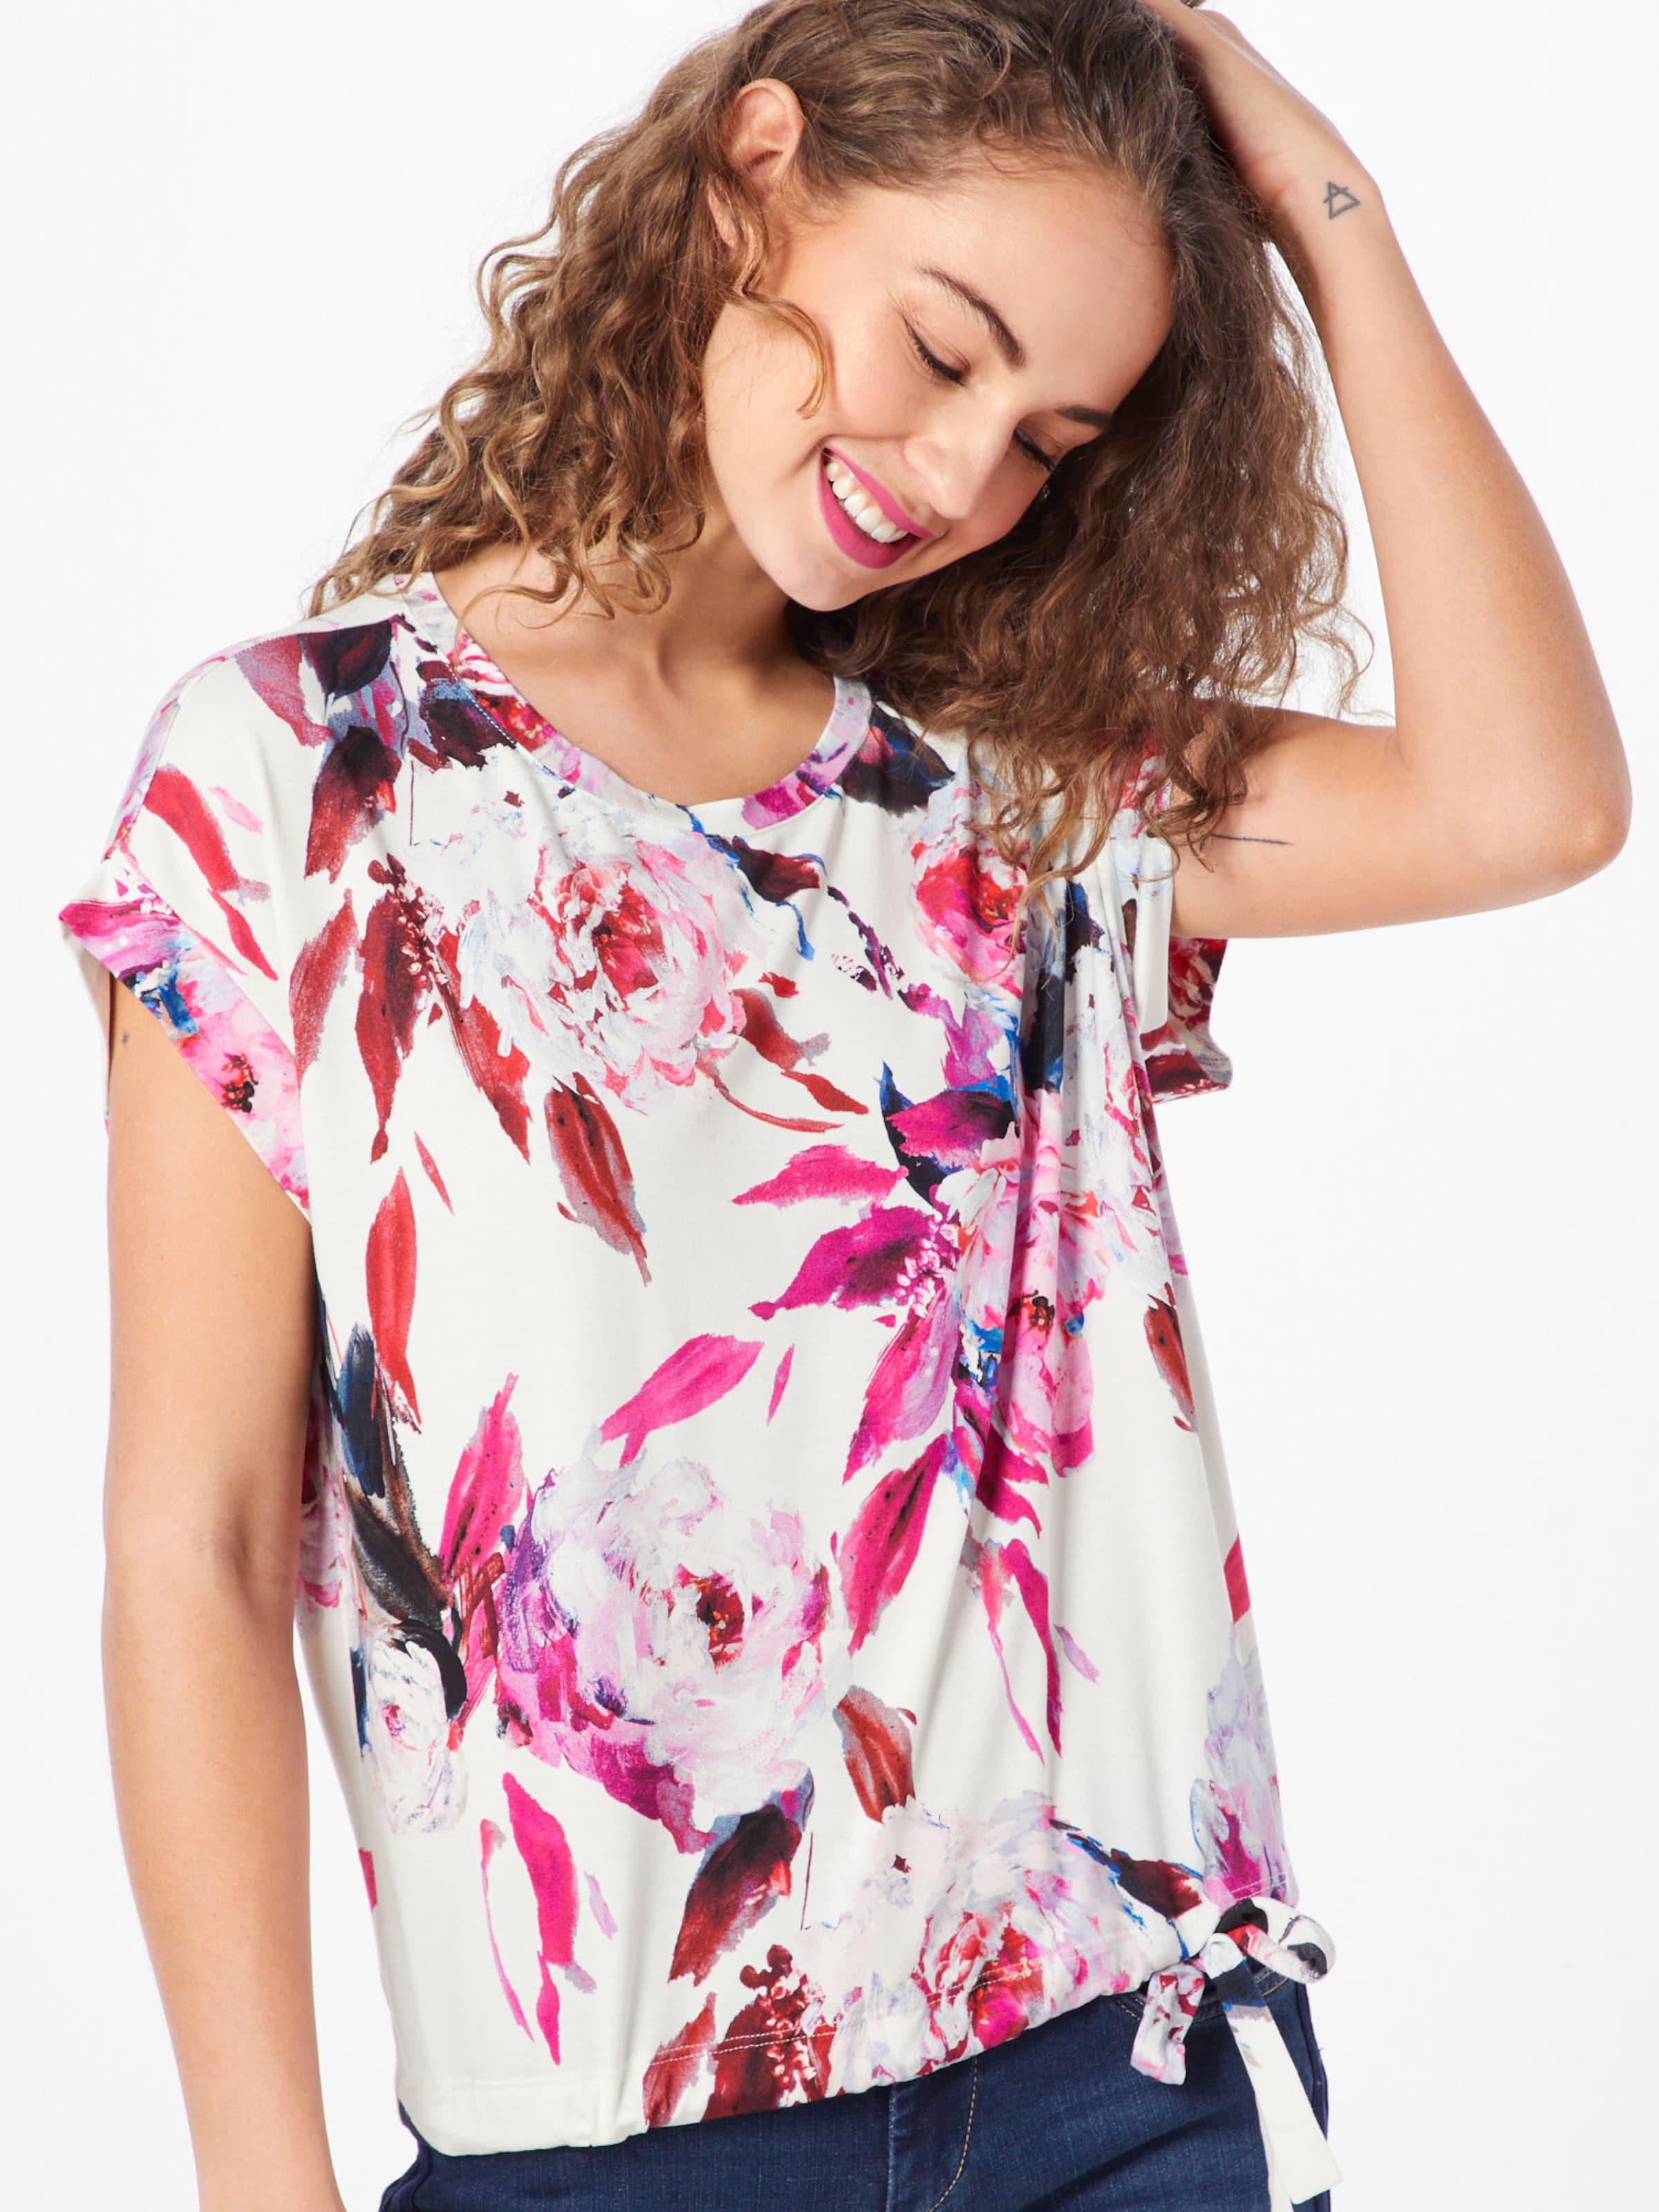 shirt Monari FoncéBlanc T En Rose clFK1TJu3